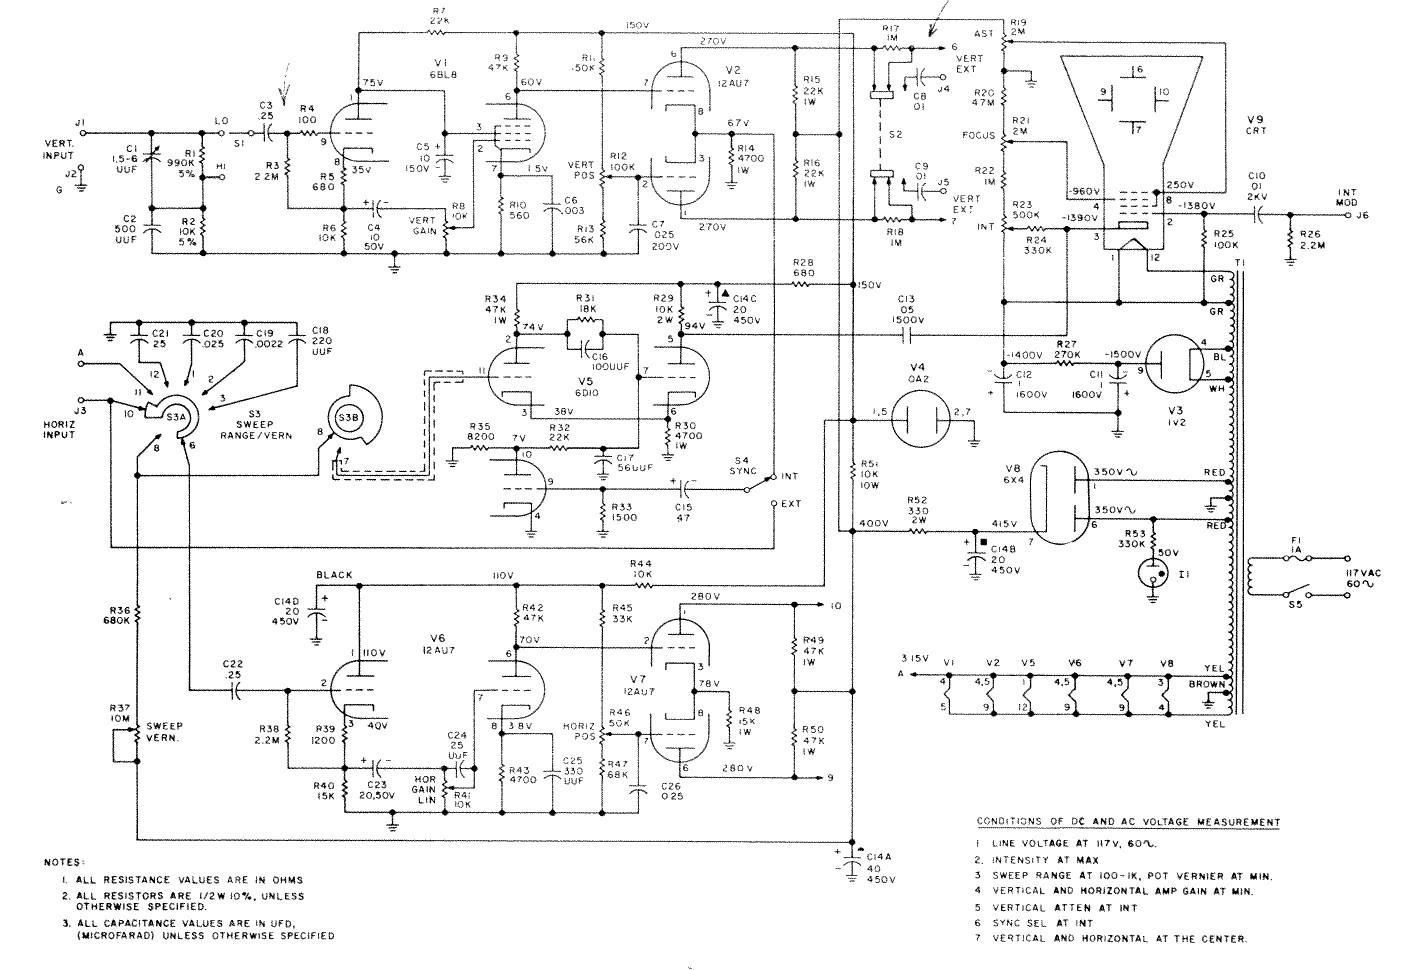 Eico 430 Oscilloscope Dr Scott M Baker Powerhorse Engine Wiring Diagram An Error Occurred